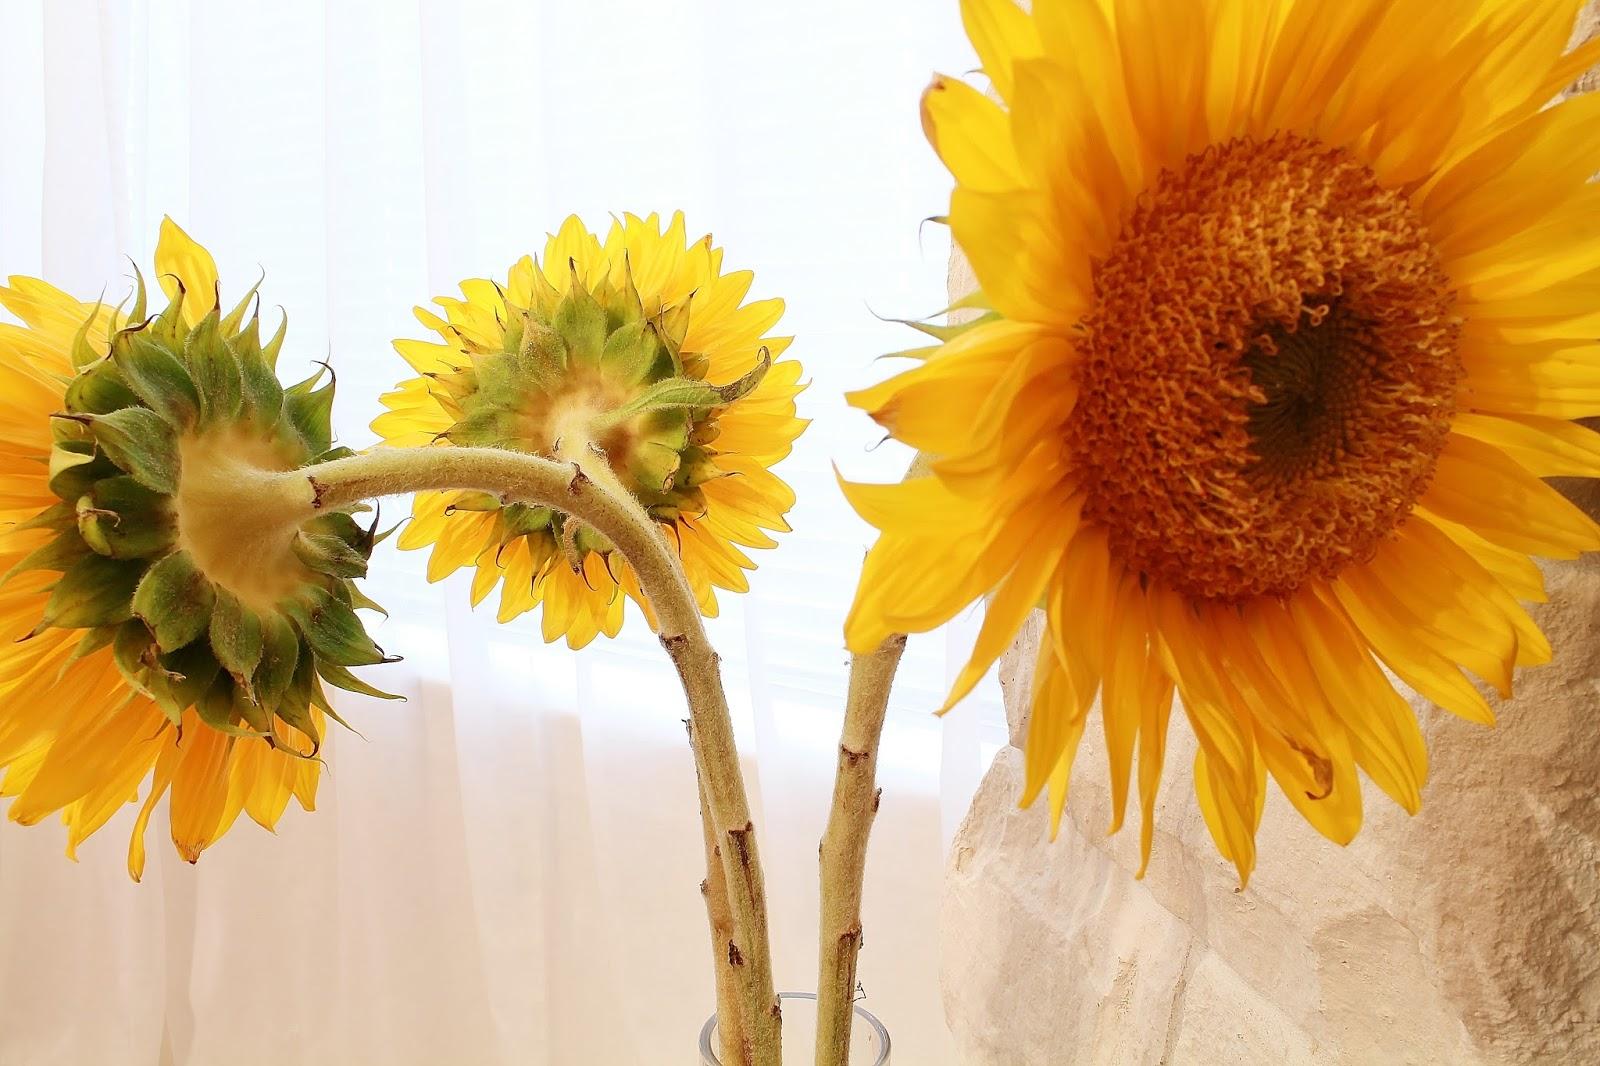 sturch photography sunflowers fibonacci and the zen of